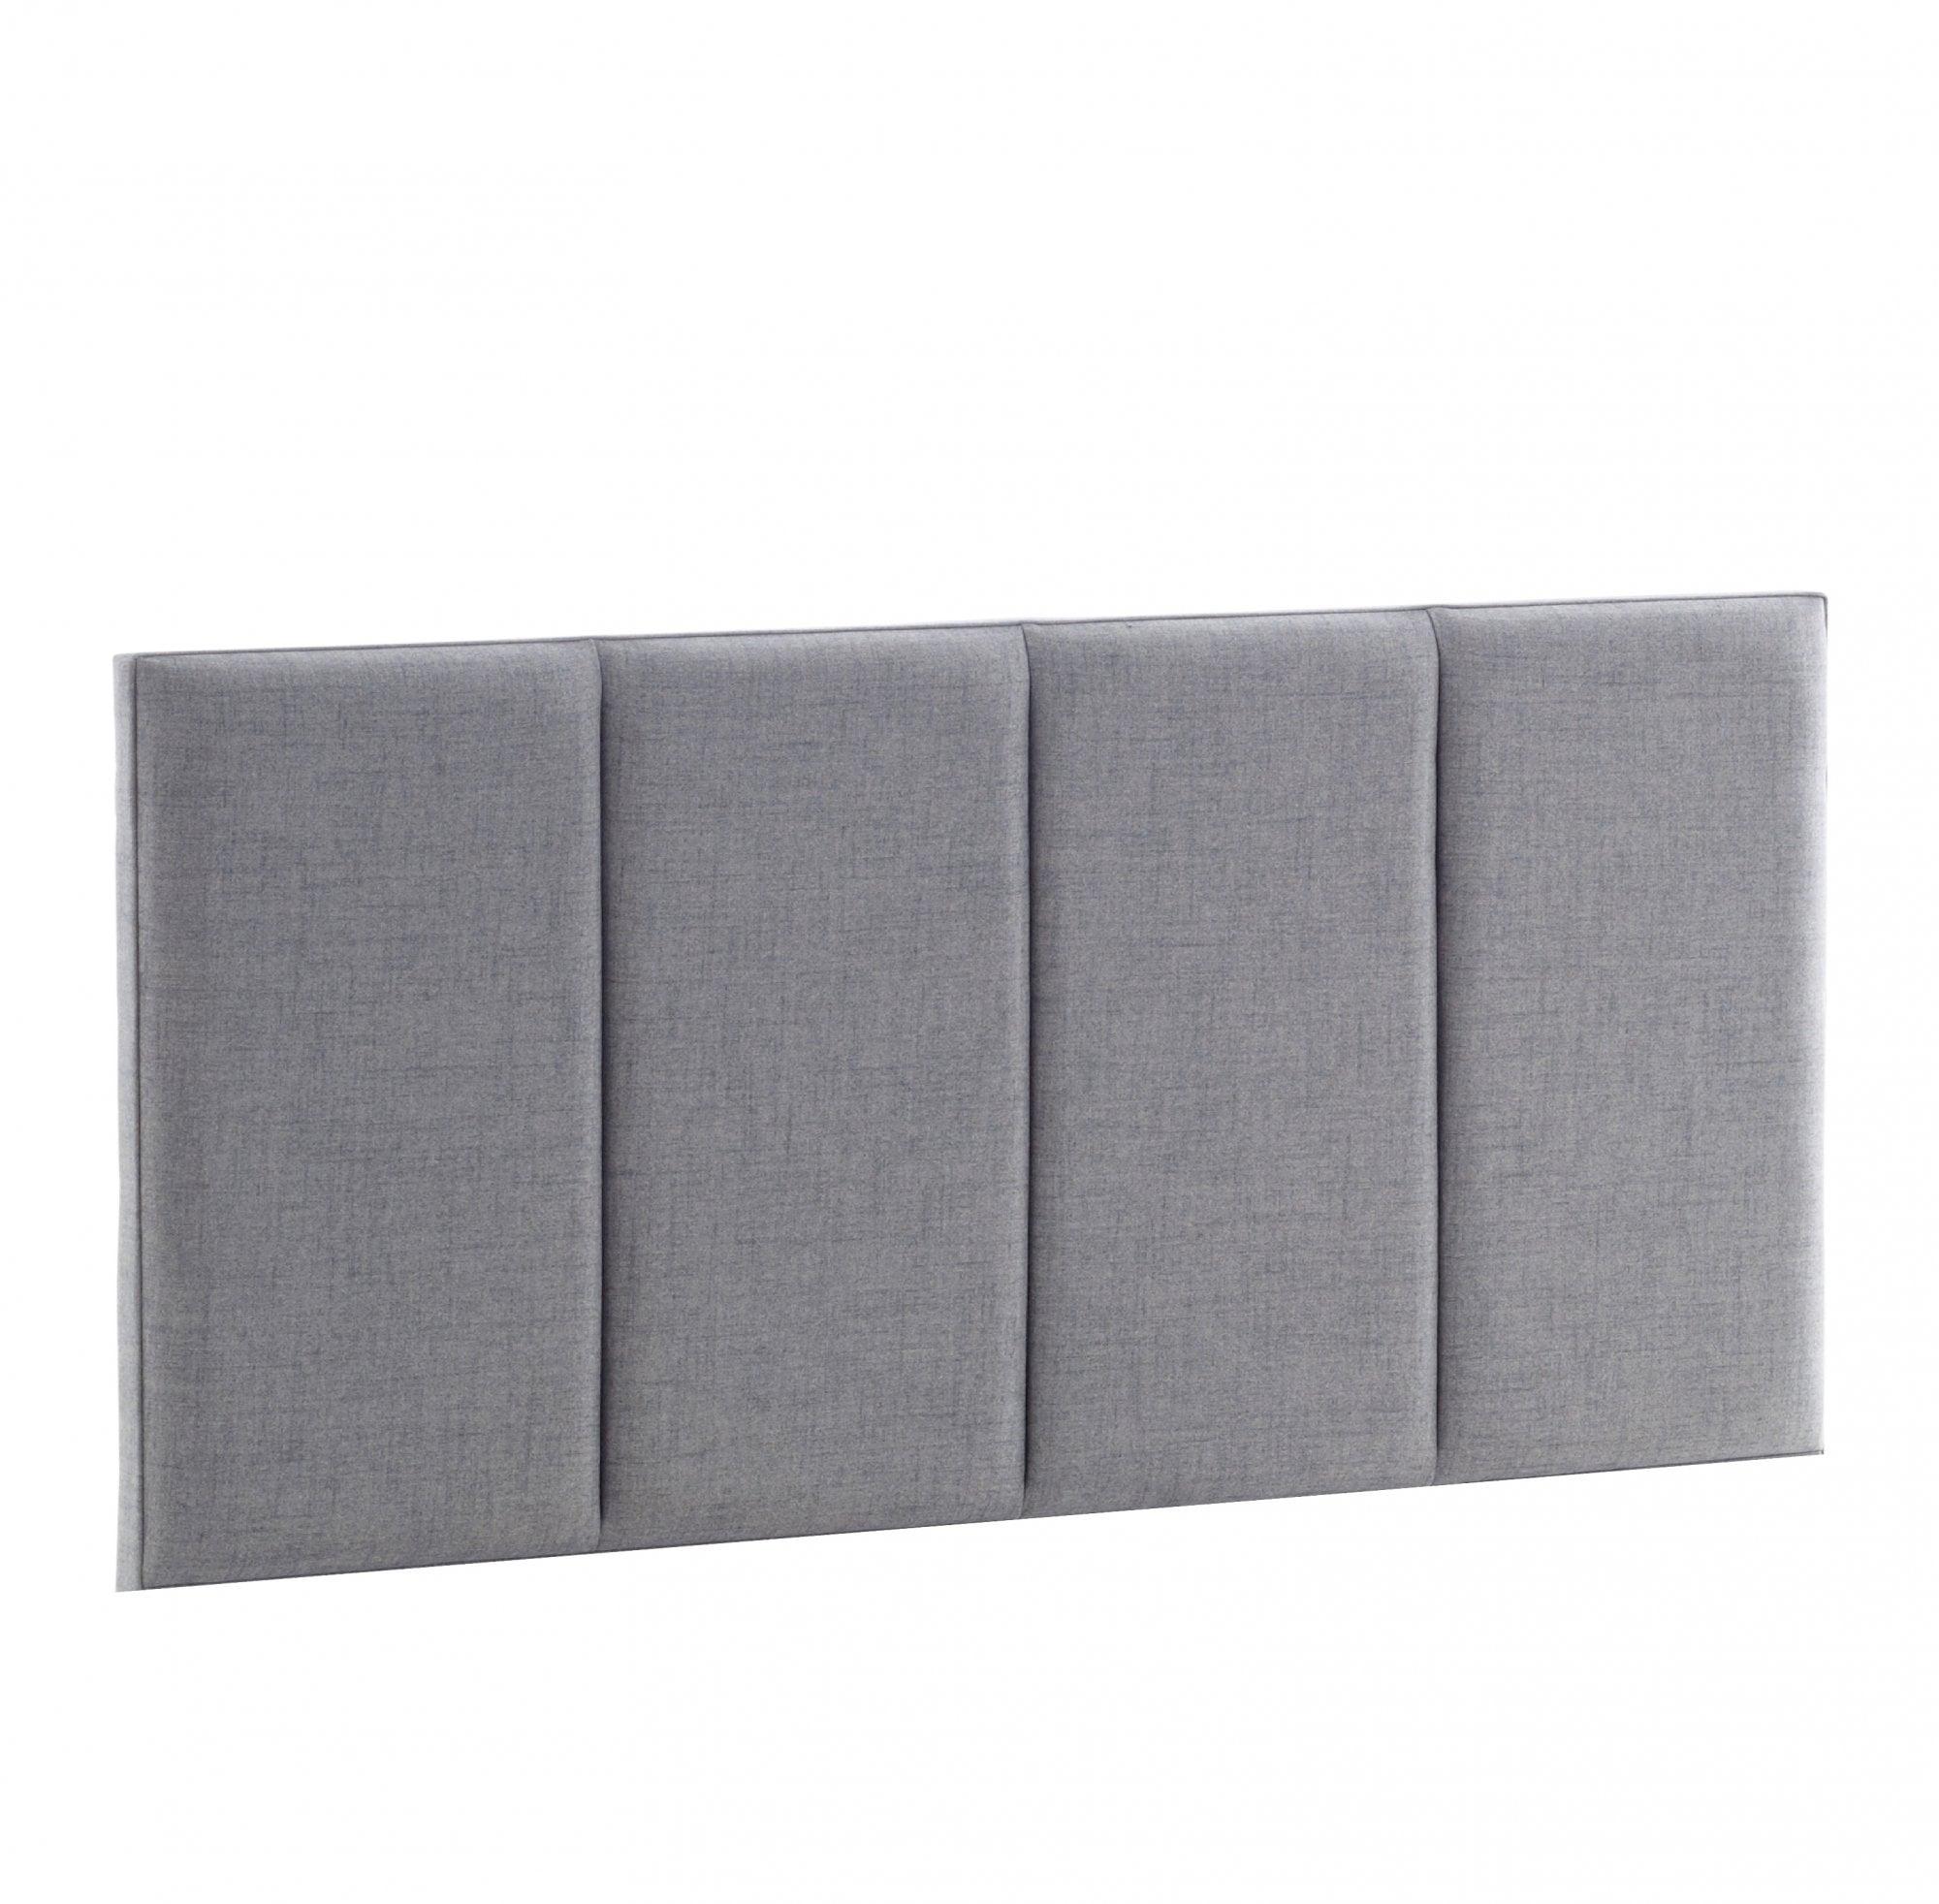 London 24 Fabric Headboard Bed Mattress Sale From Readers Interiors Uk